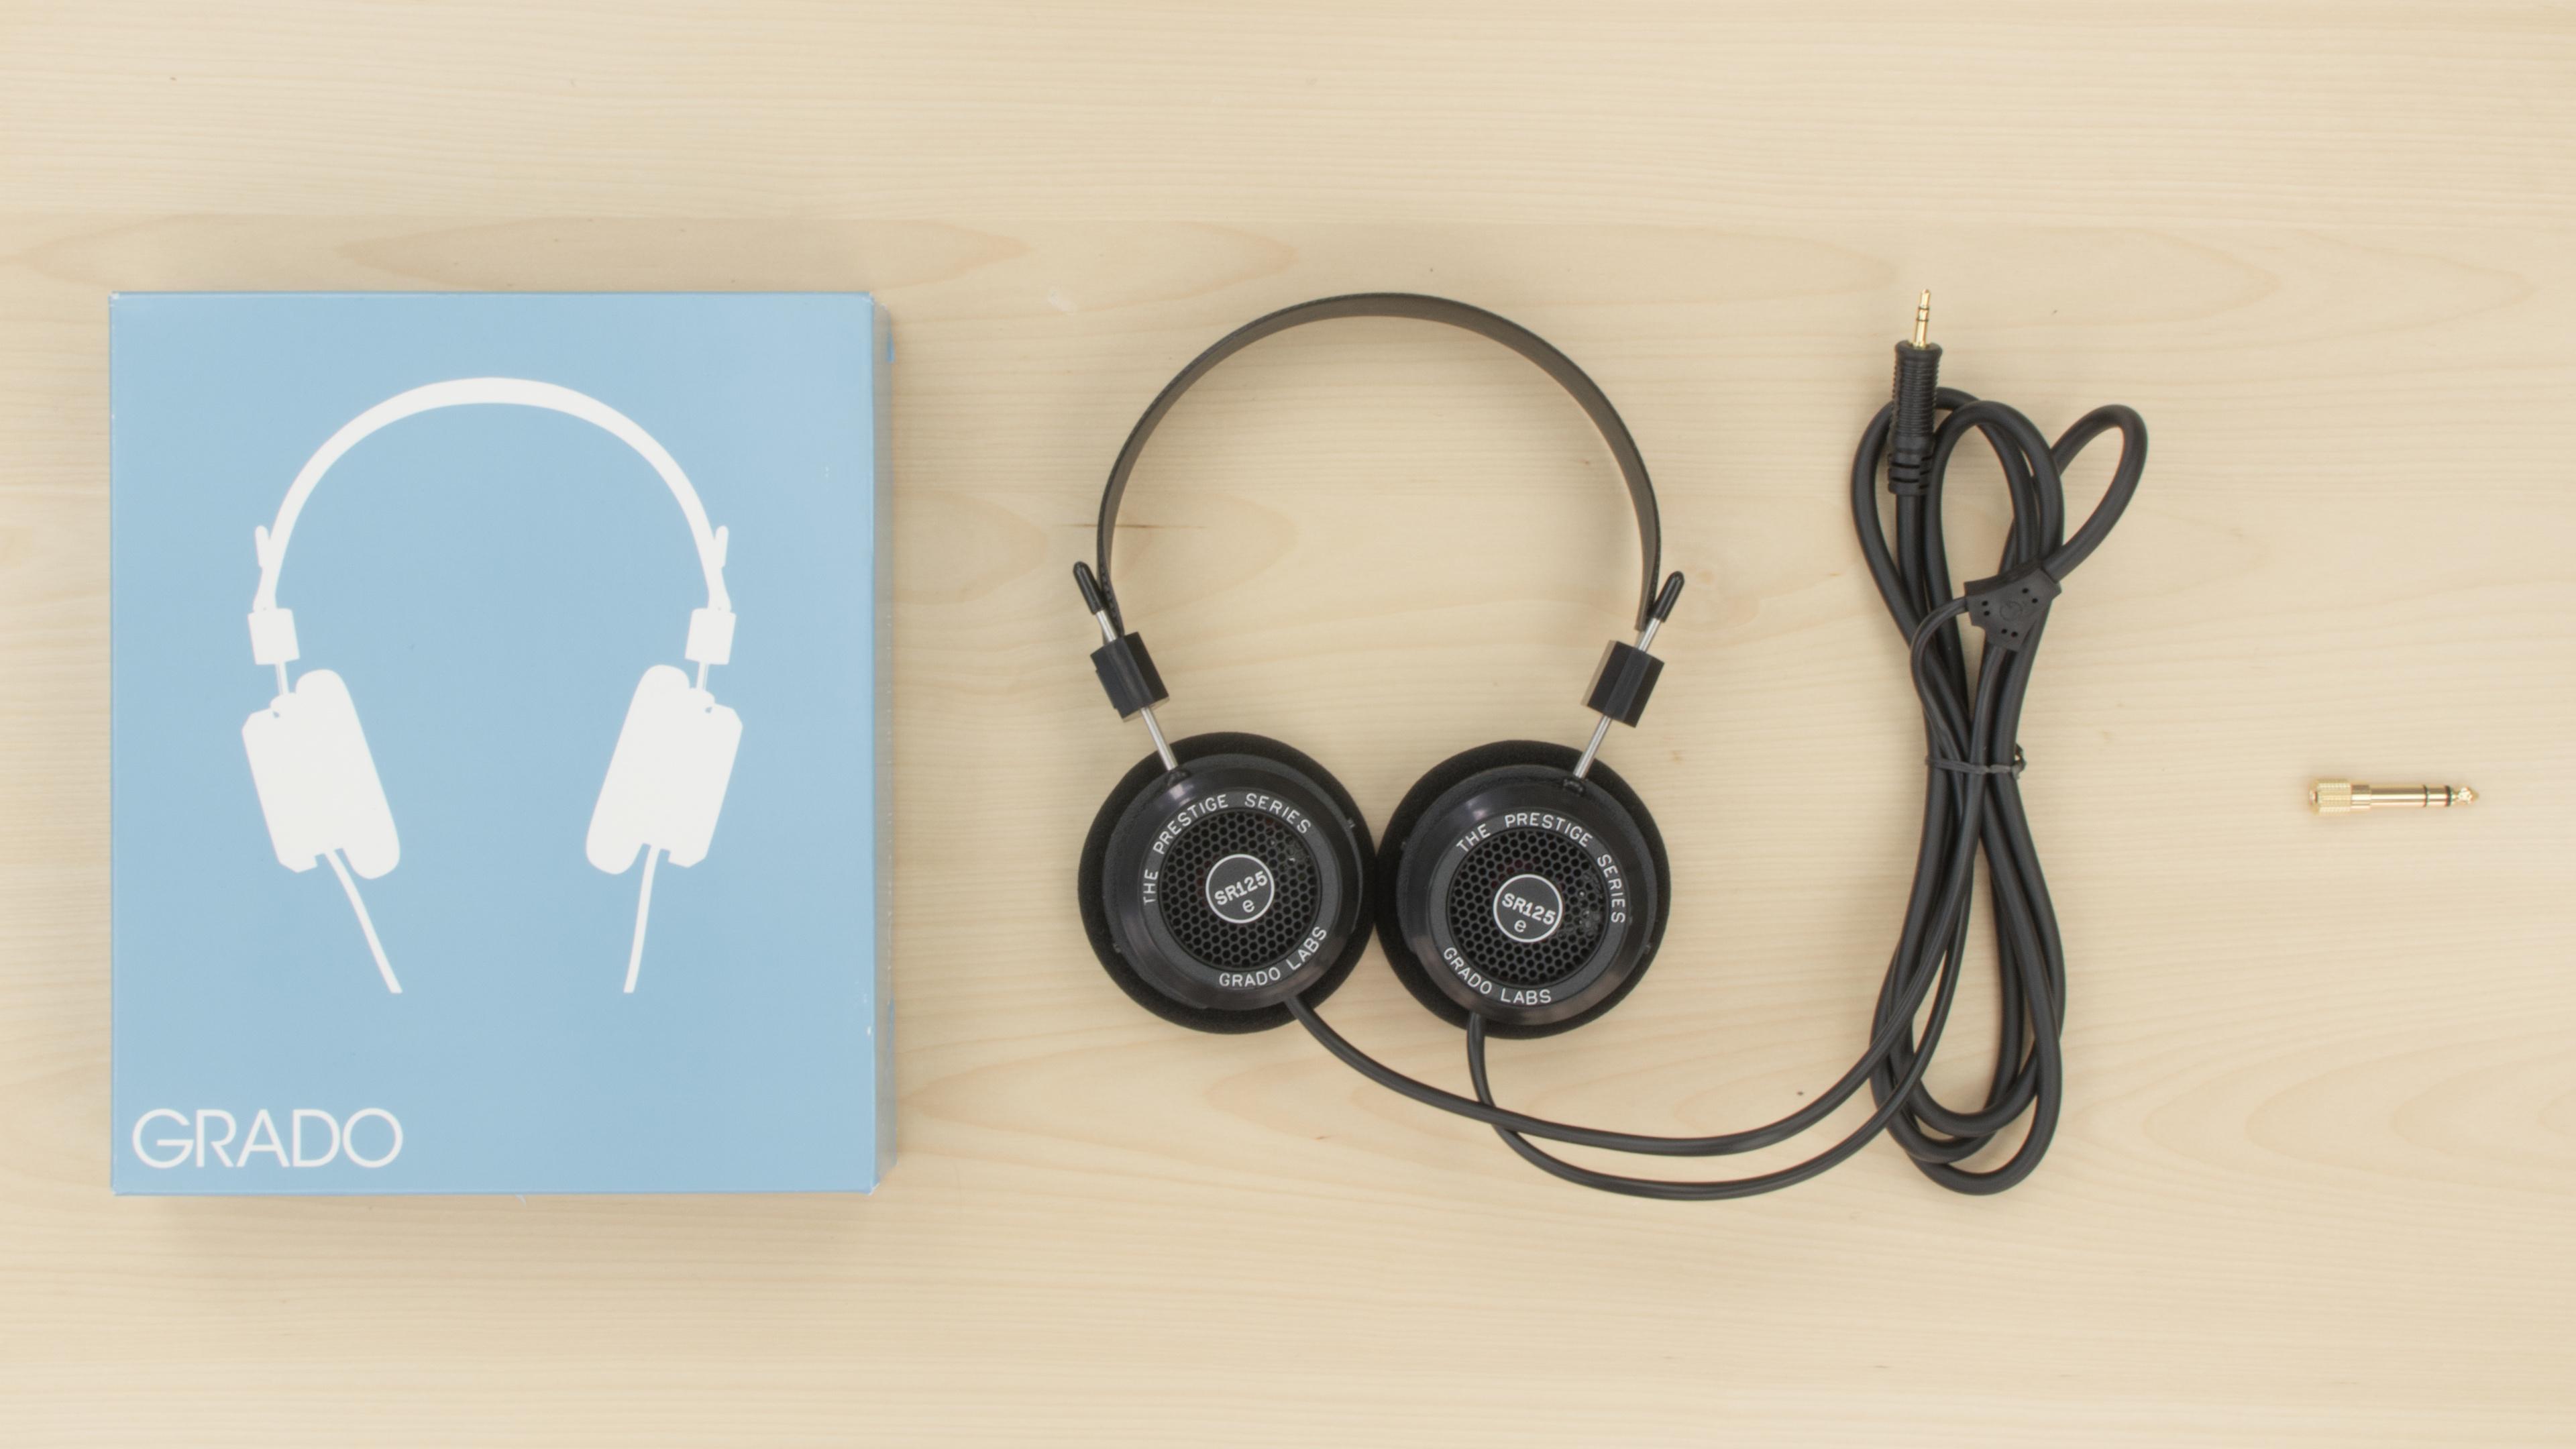 Grado Headphones Wiring Diagram Electrical Diagrams Sr125 Enthusiast U2022 Aviation Headset